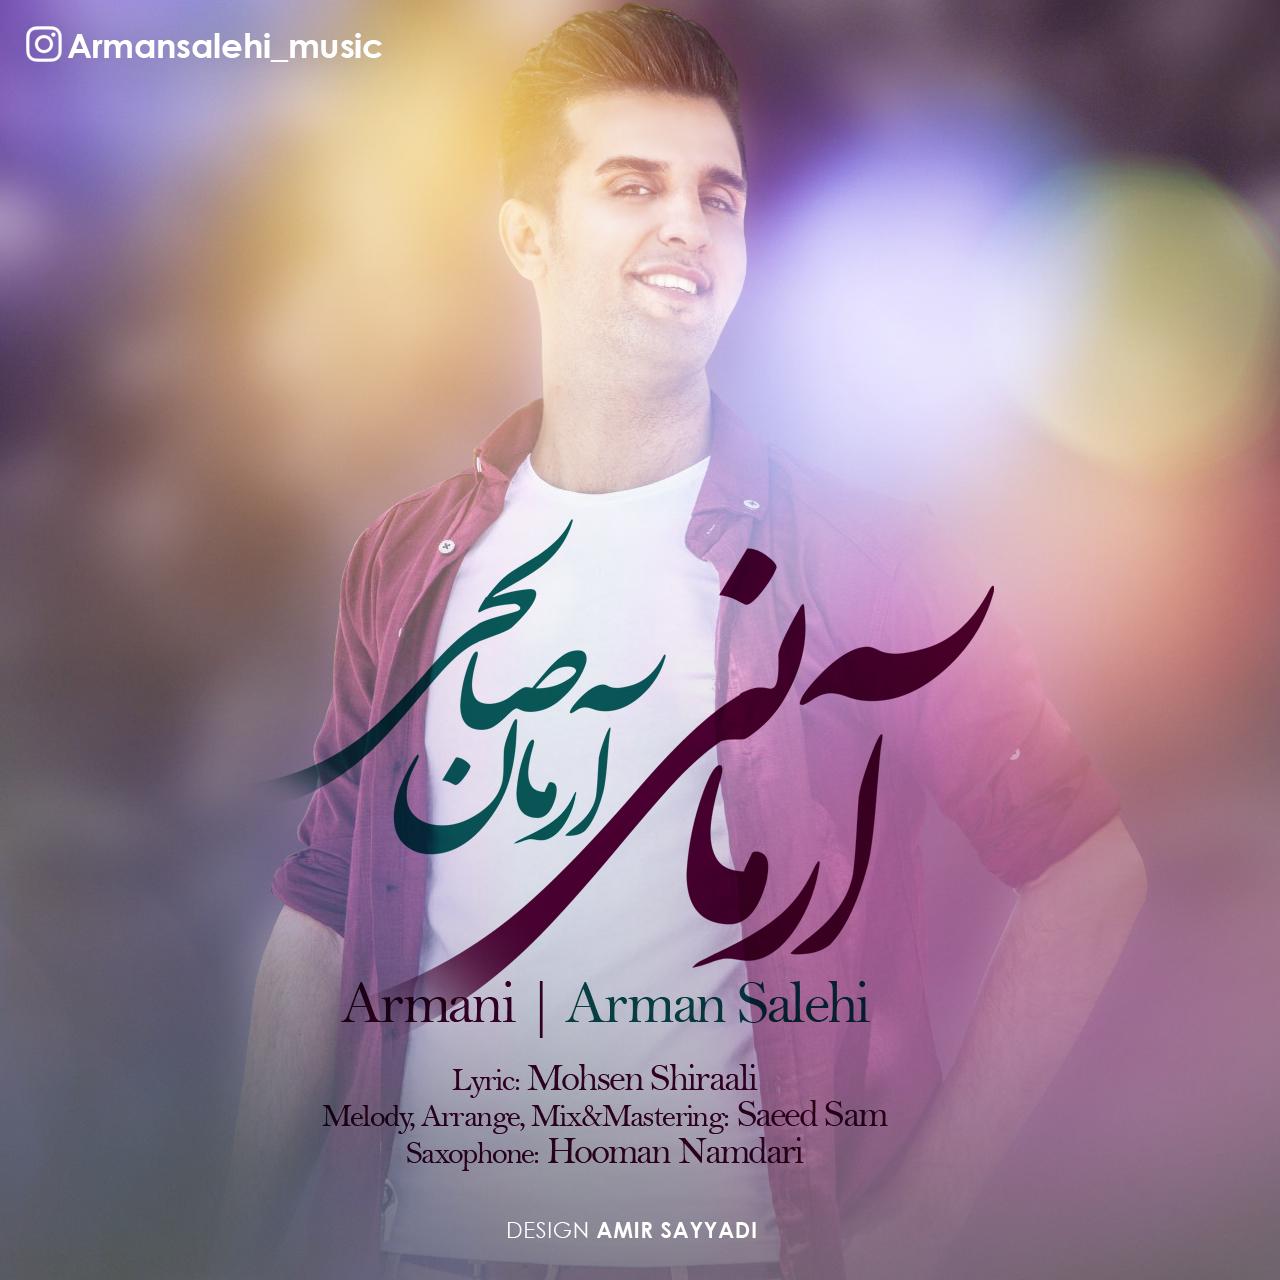 Arman Salehi – Armani